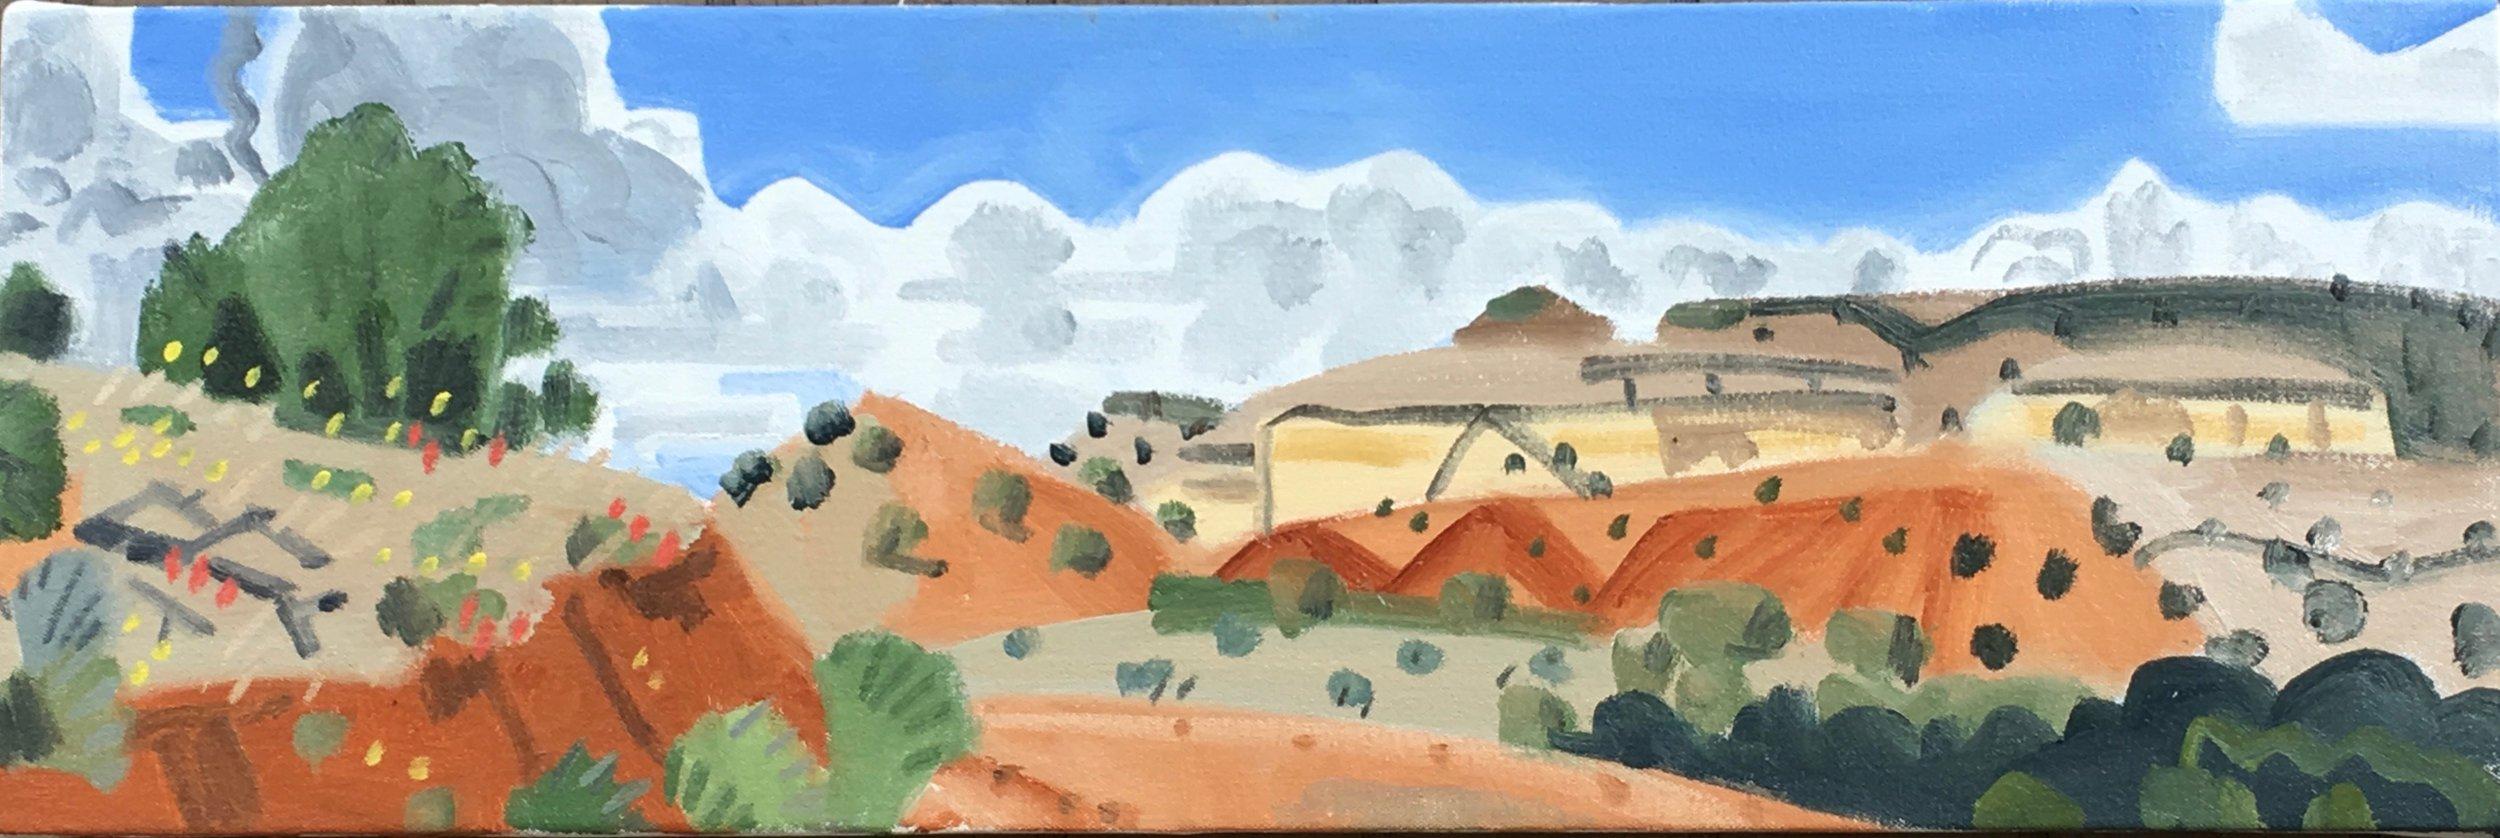 "Wild Flowers on Monastery Road, 10 x 30"", oil on canvas, 2017"